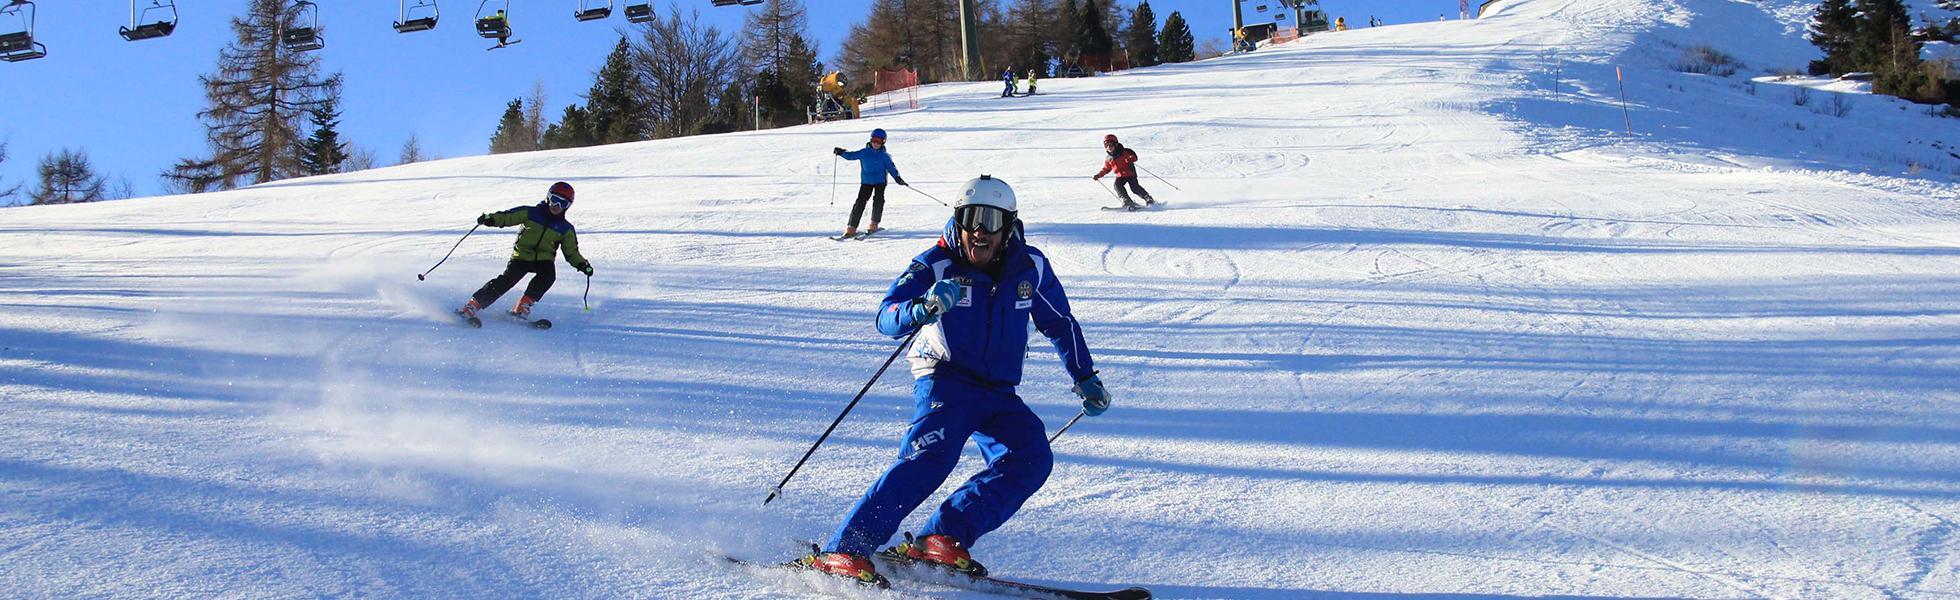 Frabosa Soprana - Mondolé Ski